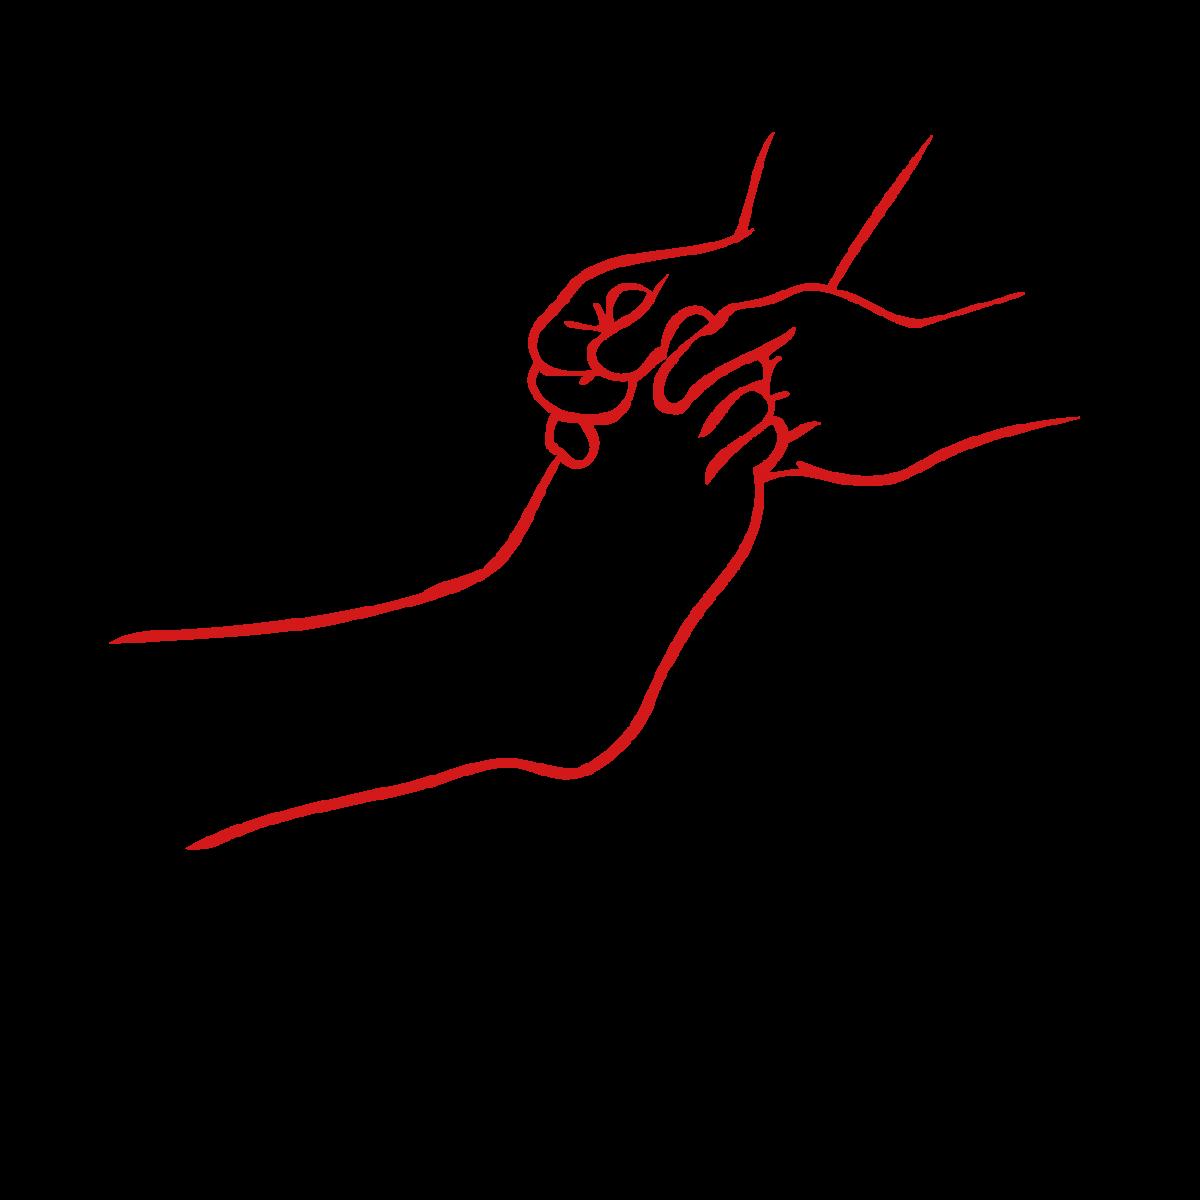 massages clipart foot rub